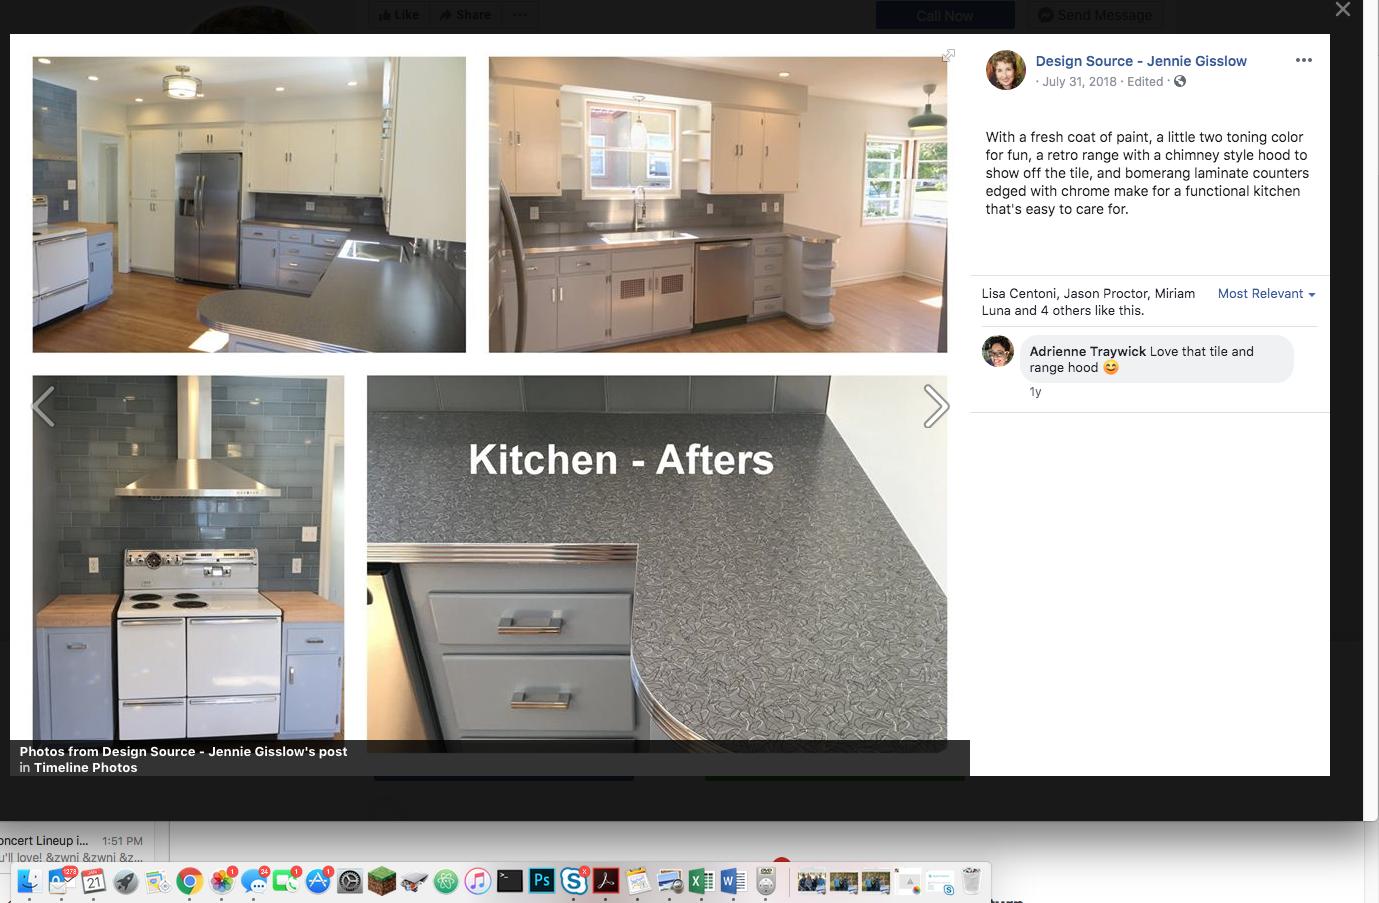 Reusing Existing Cabinets In 2020 Kitchen Remodel Design Cabinet